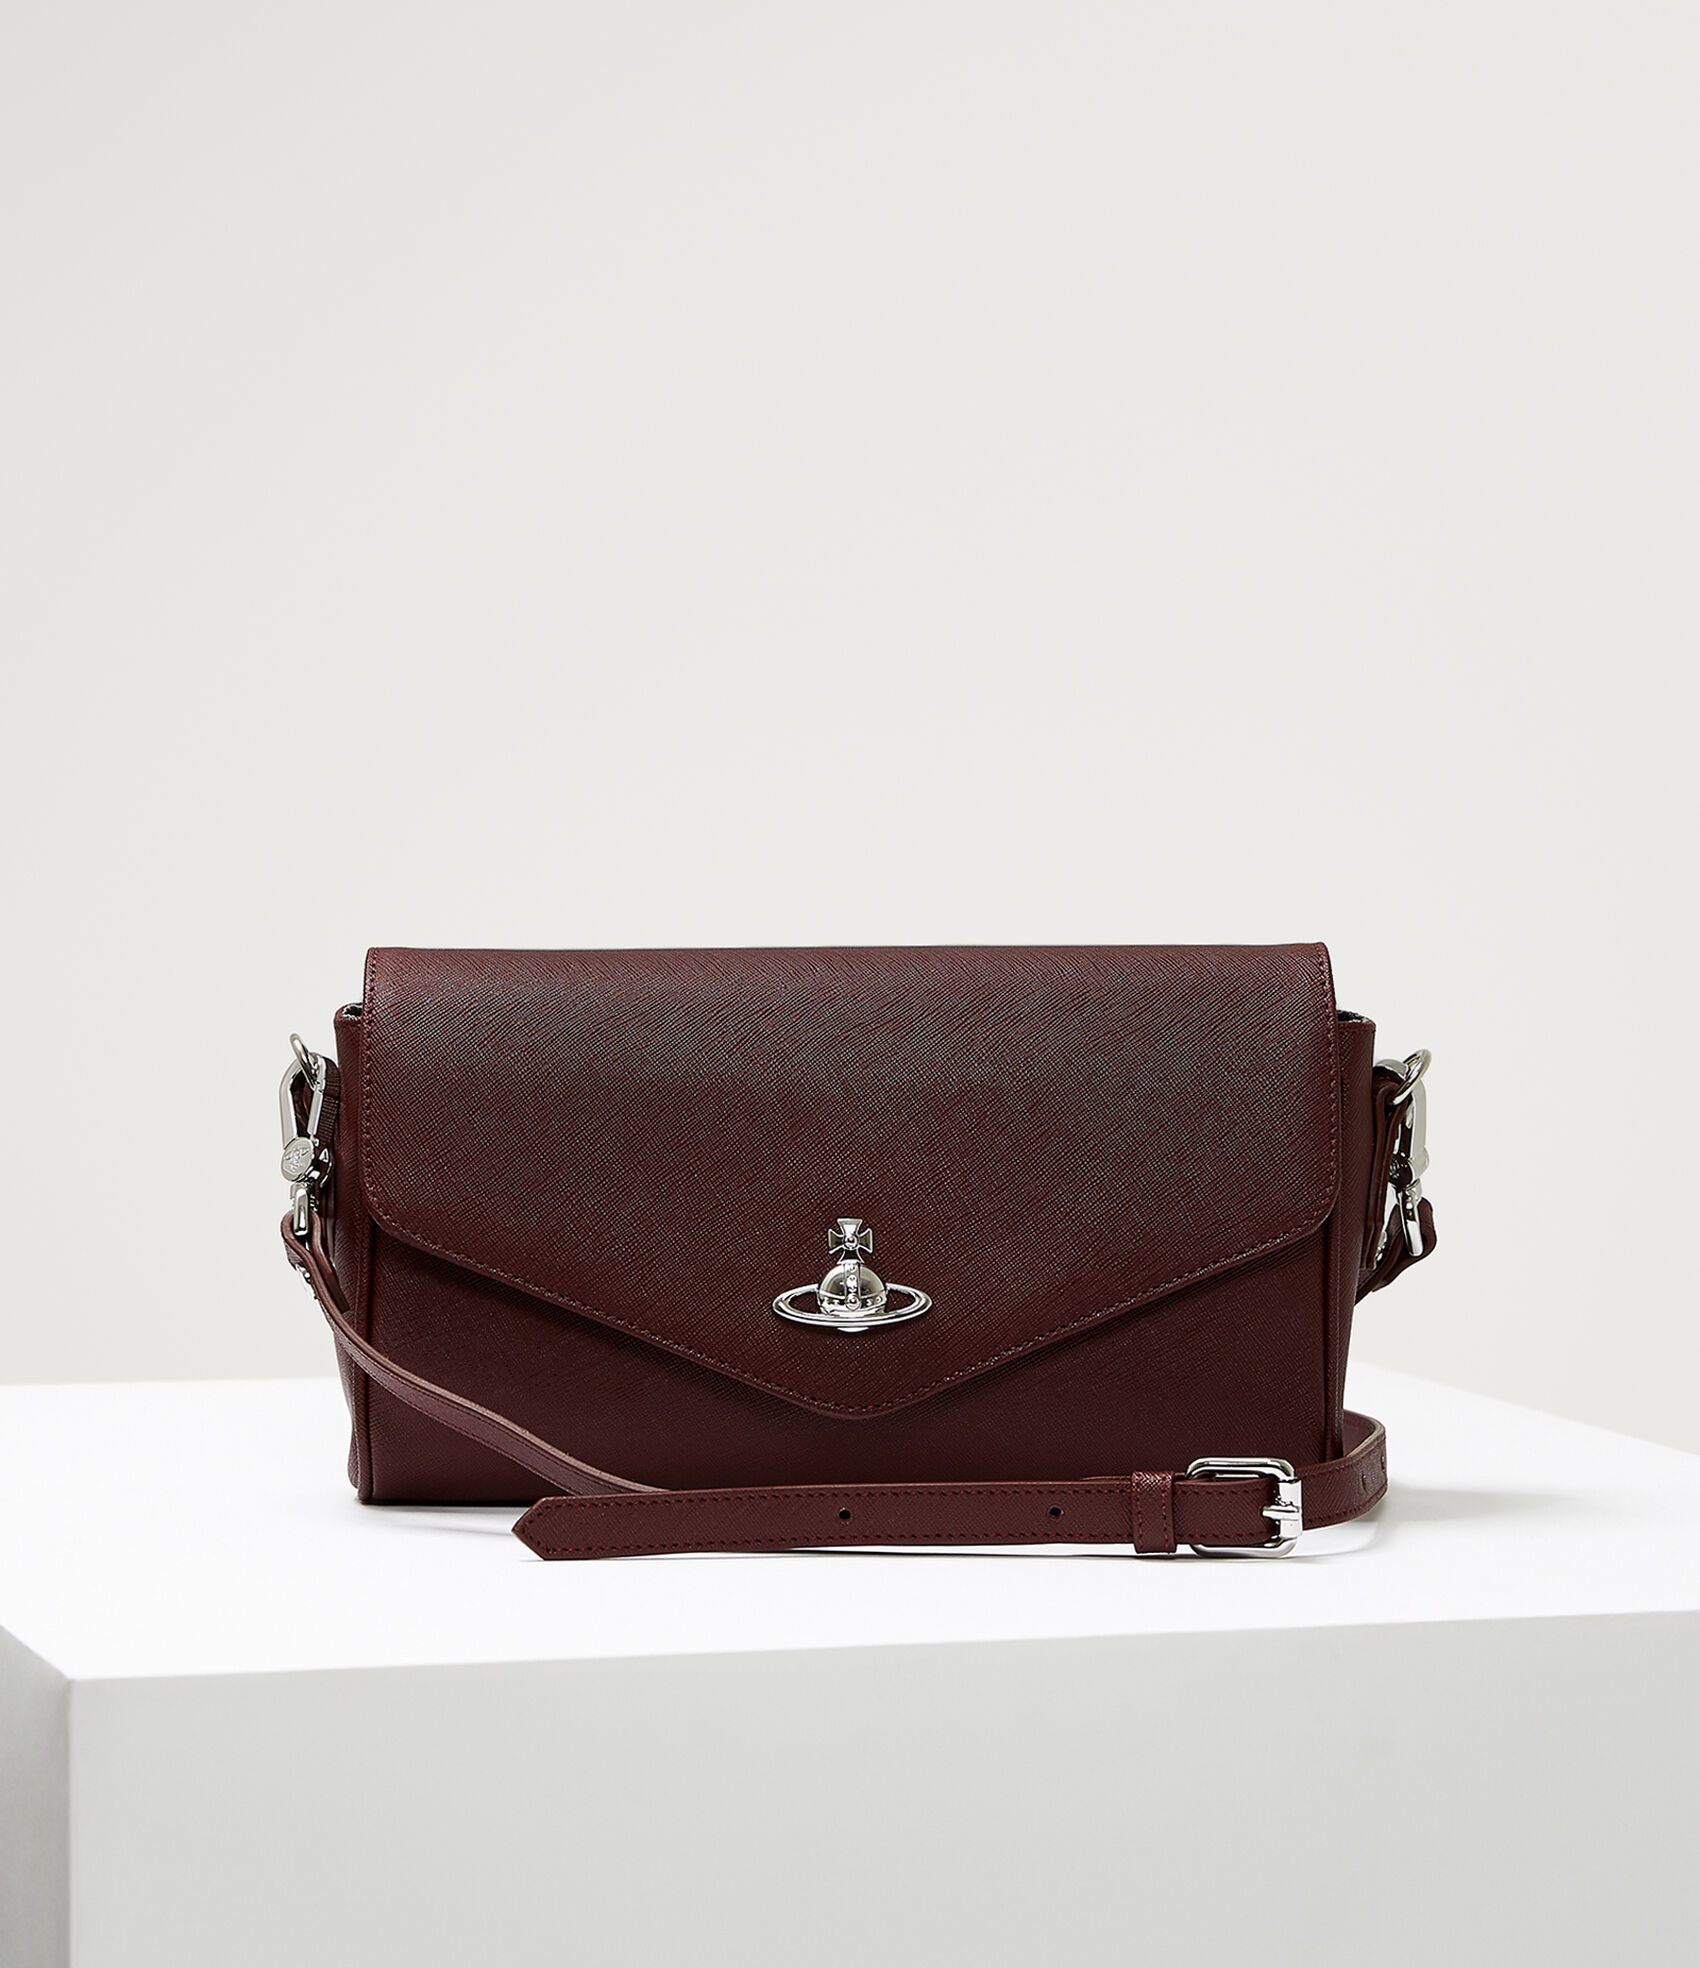 Vivienne Westwood Women S Designer Crossbody Bags Victoria Large Burgundy